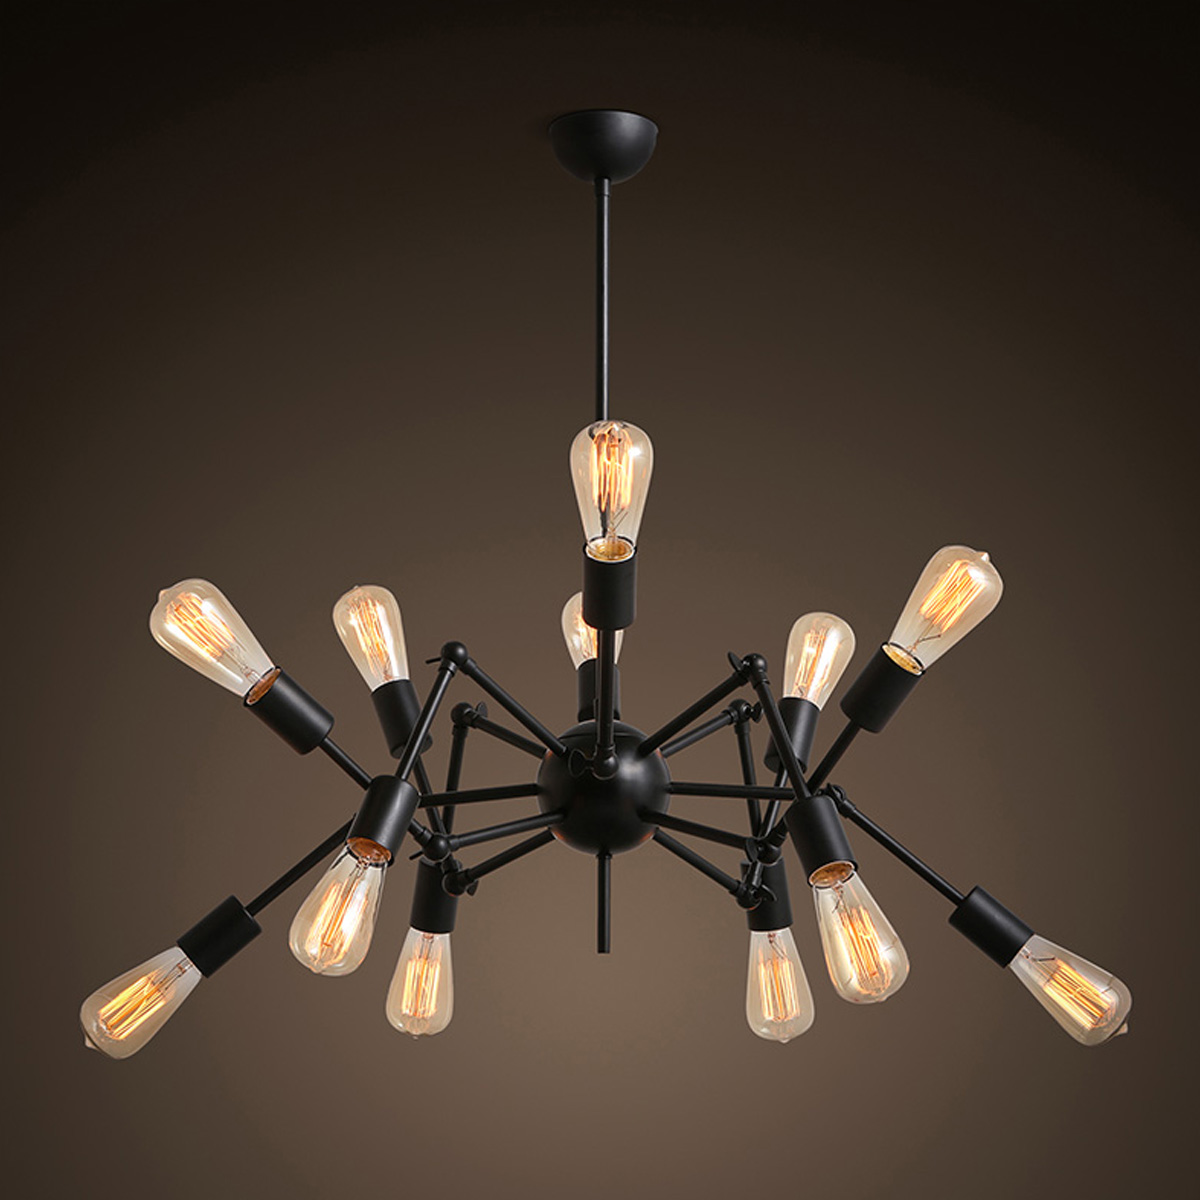 Novelty Pendant Light Vintage Black White Spider Shaped Lamp Metal Nordic Style Loft Dining Home Lighting Decor